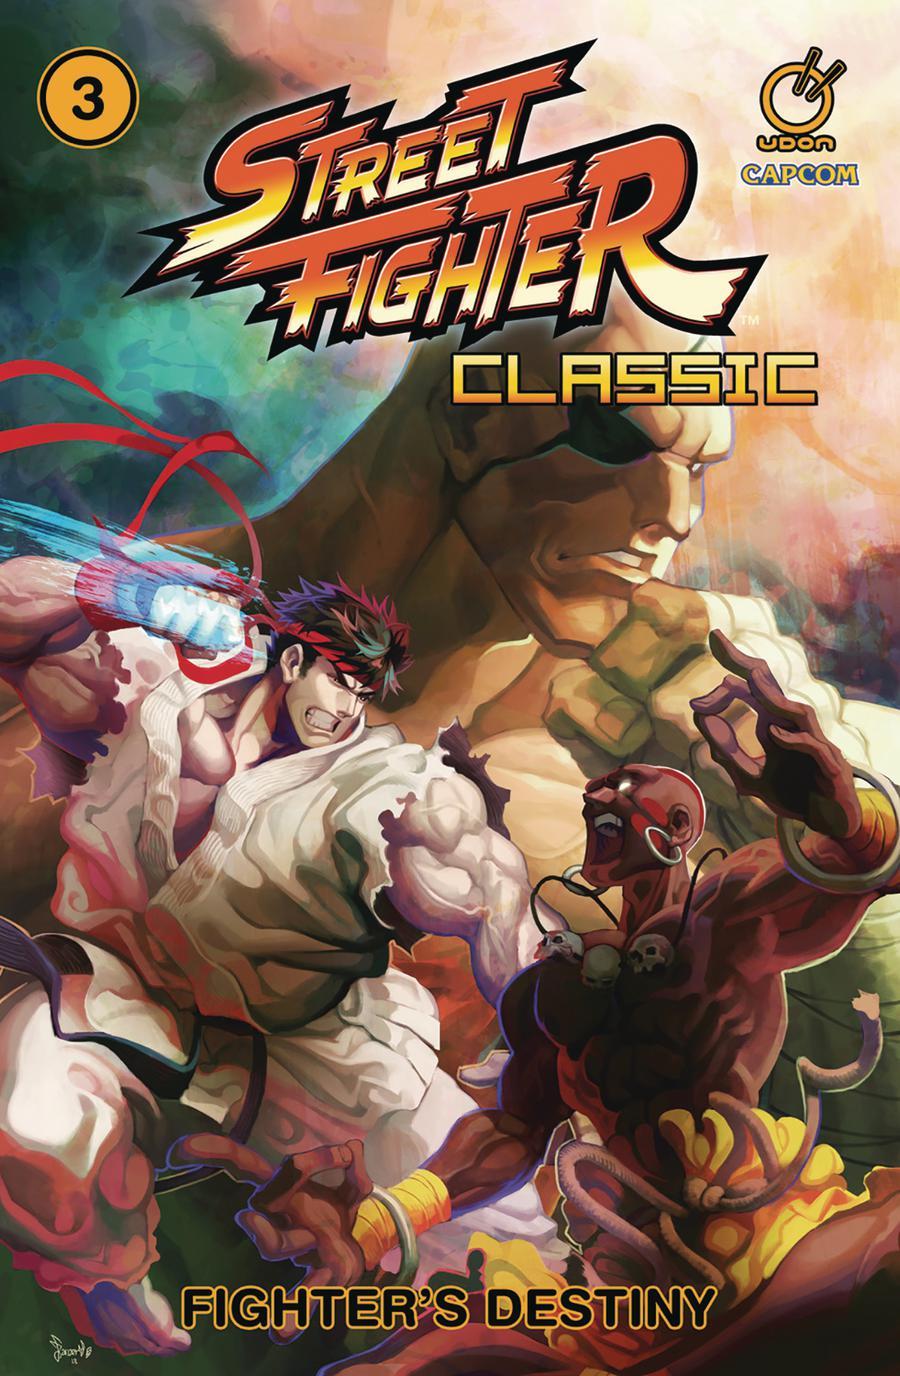 Street Fighter Classic Vol 3 Fighters Destiny TP